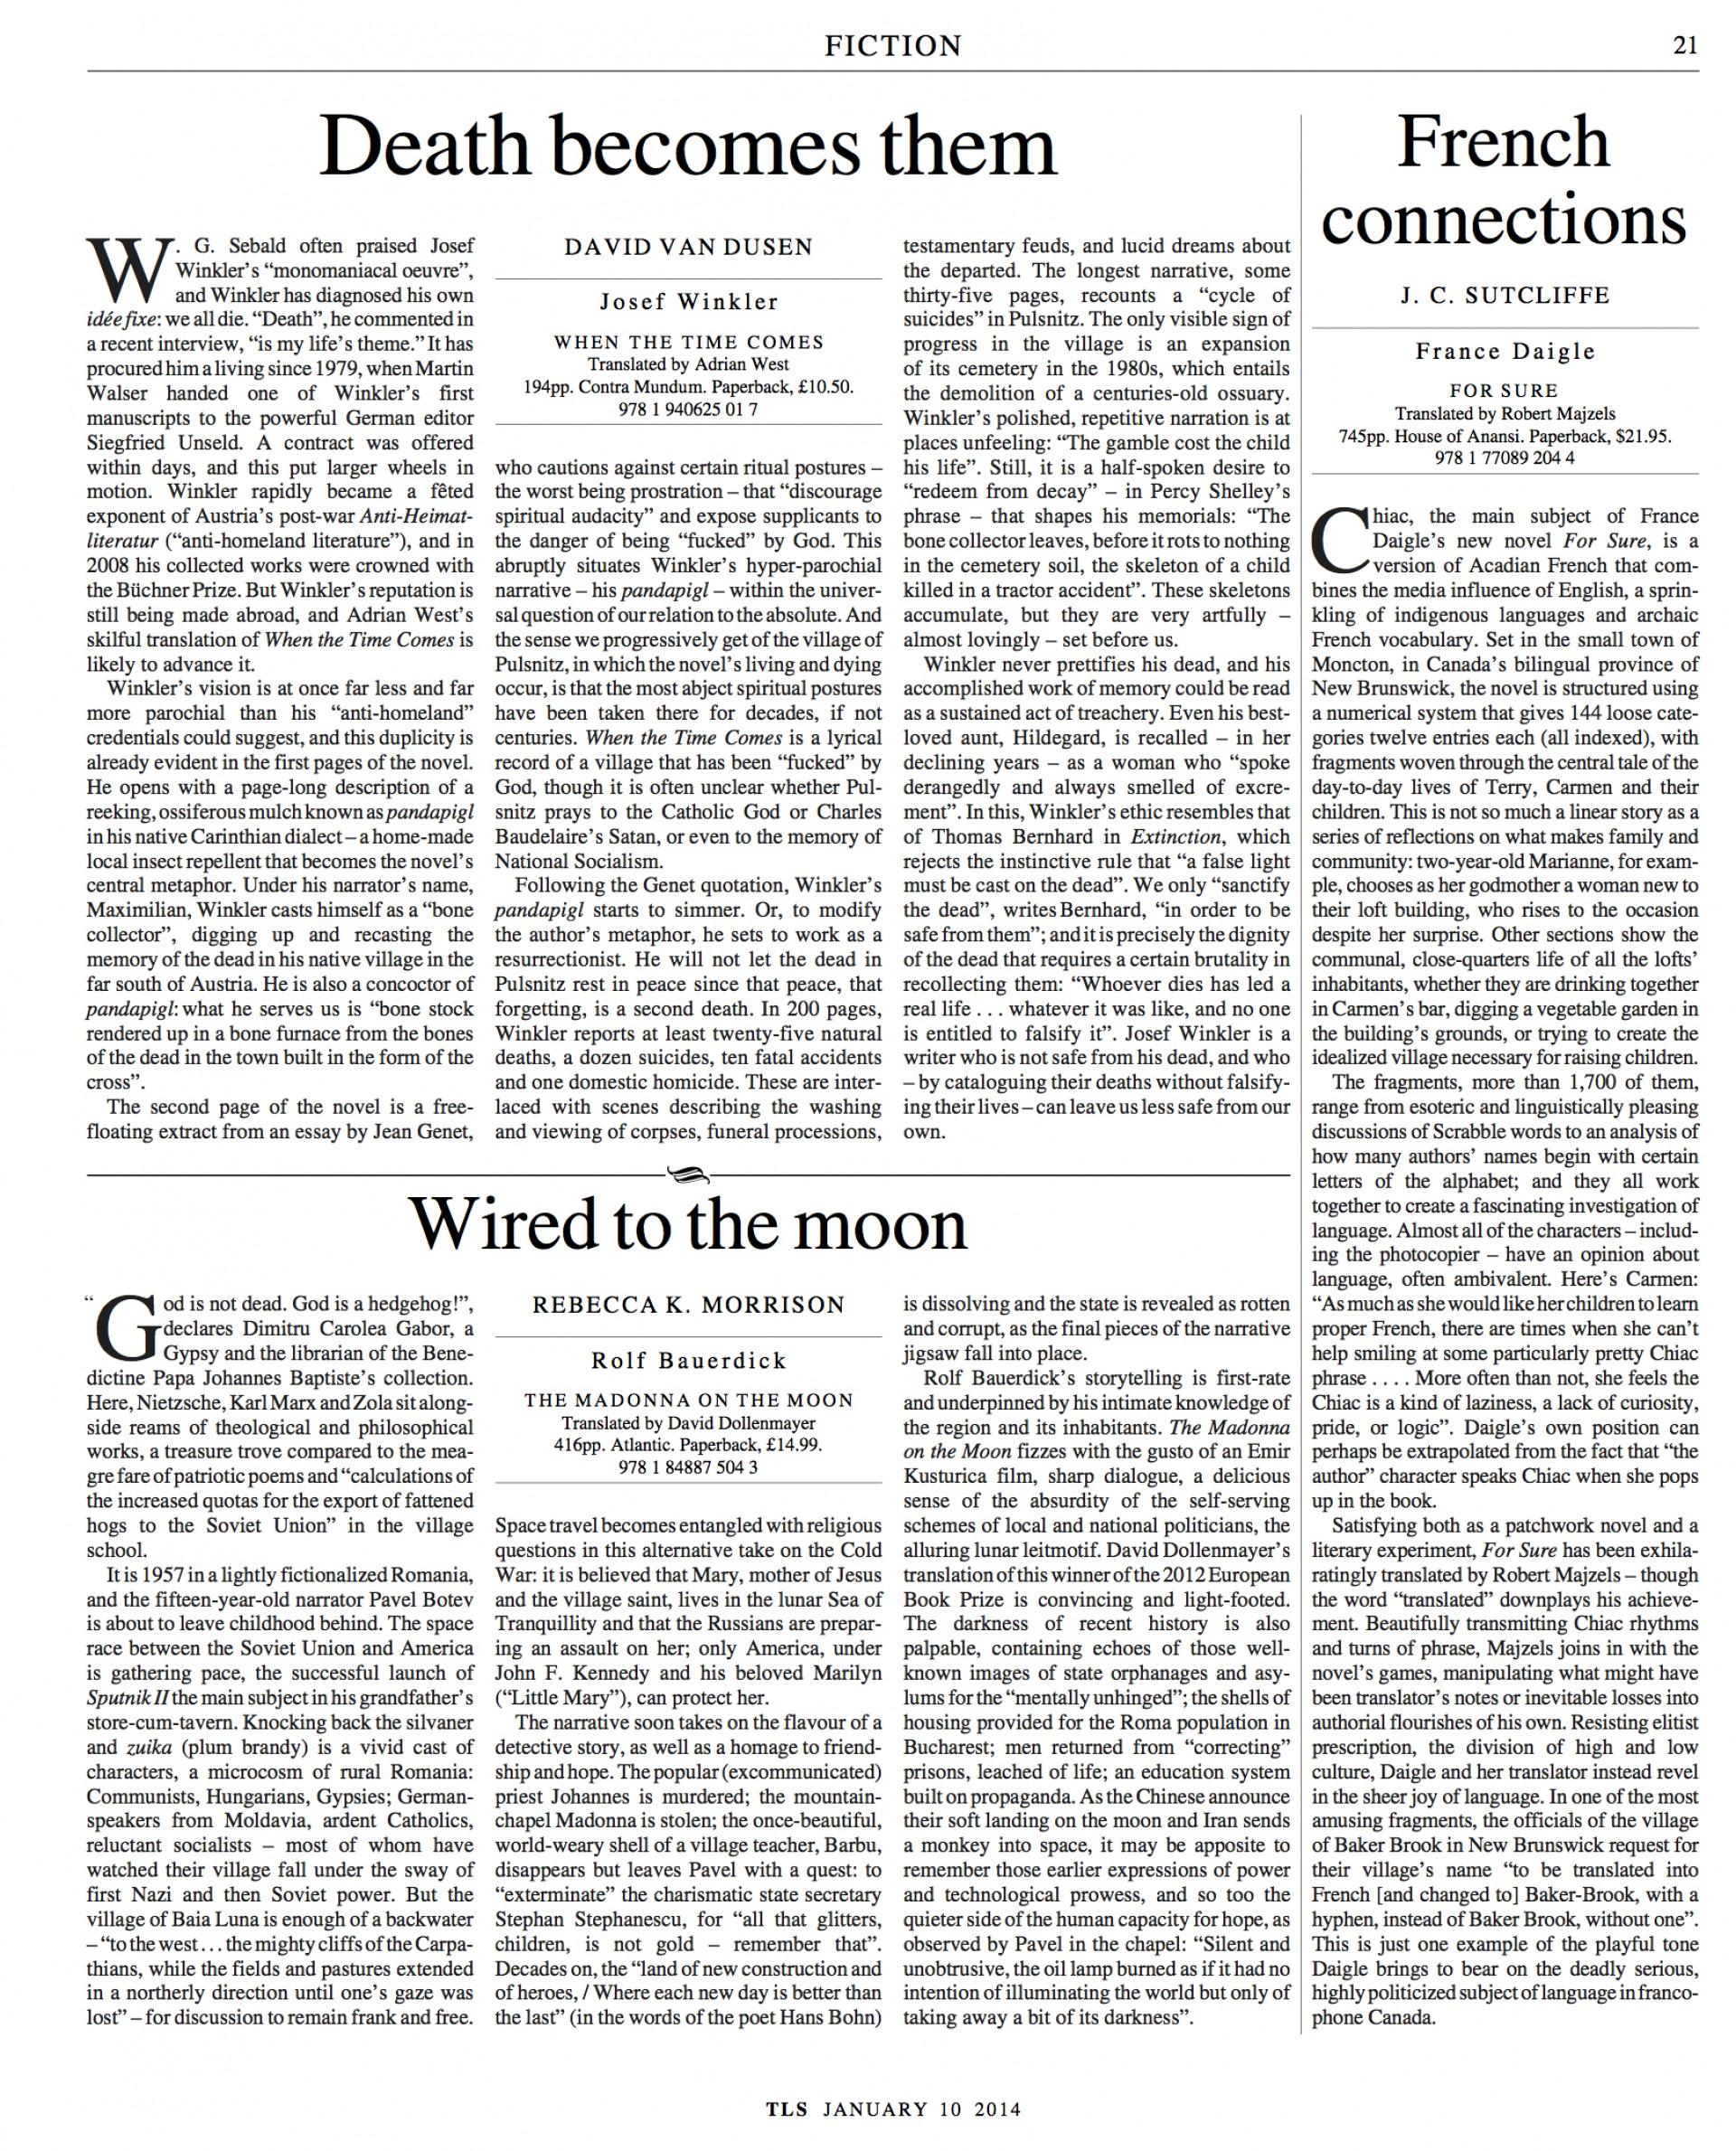 010 Essay Example Tls Josef Winkler Translate My Into Remarkable Spanish 1920